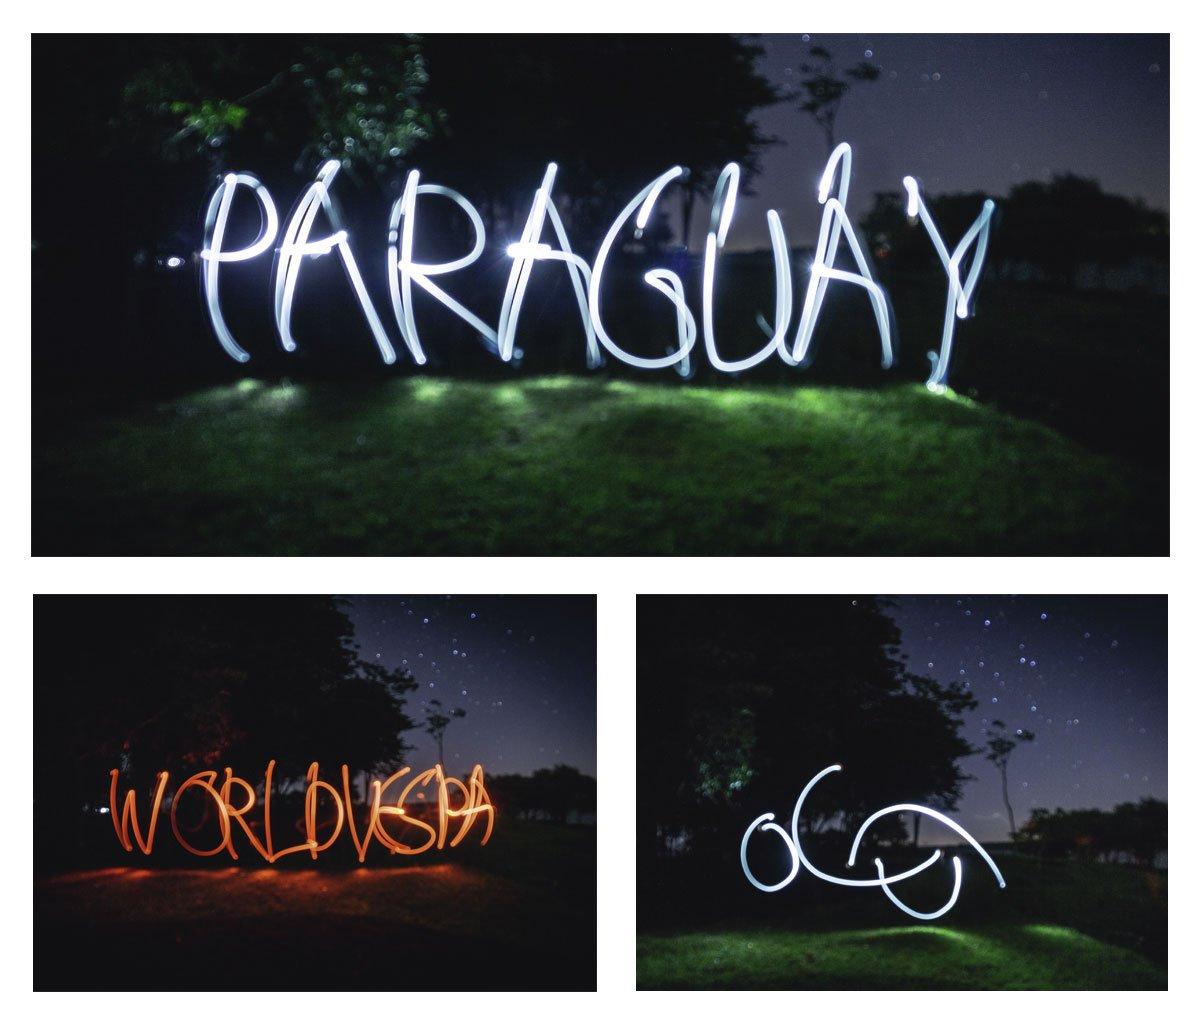 rohayhu paraguay lightpainting